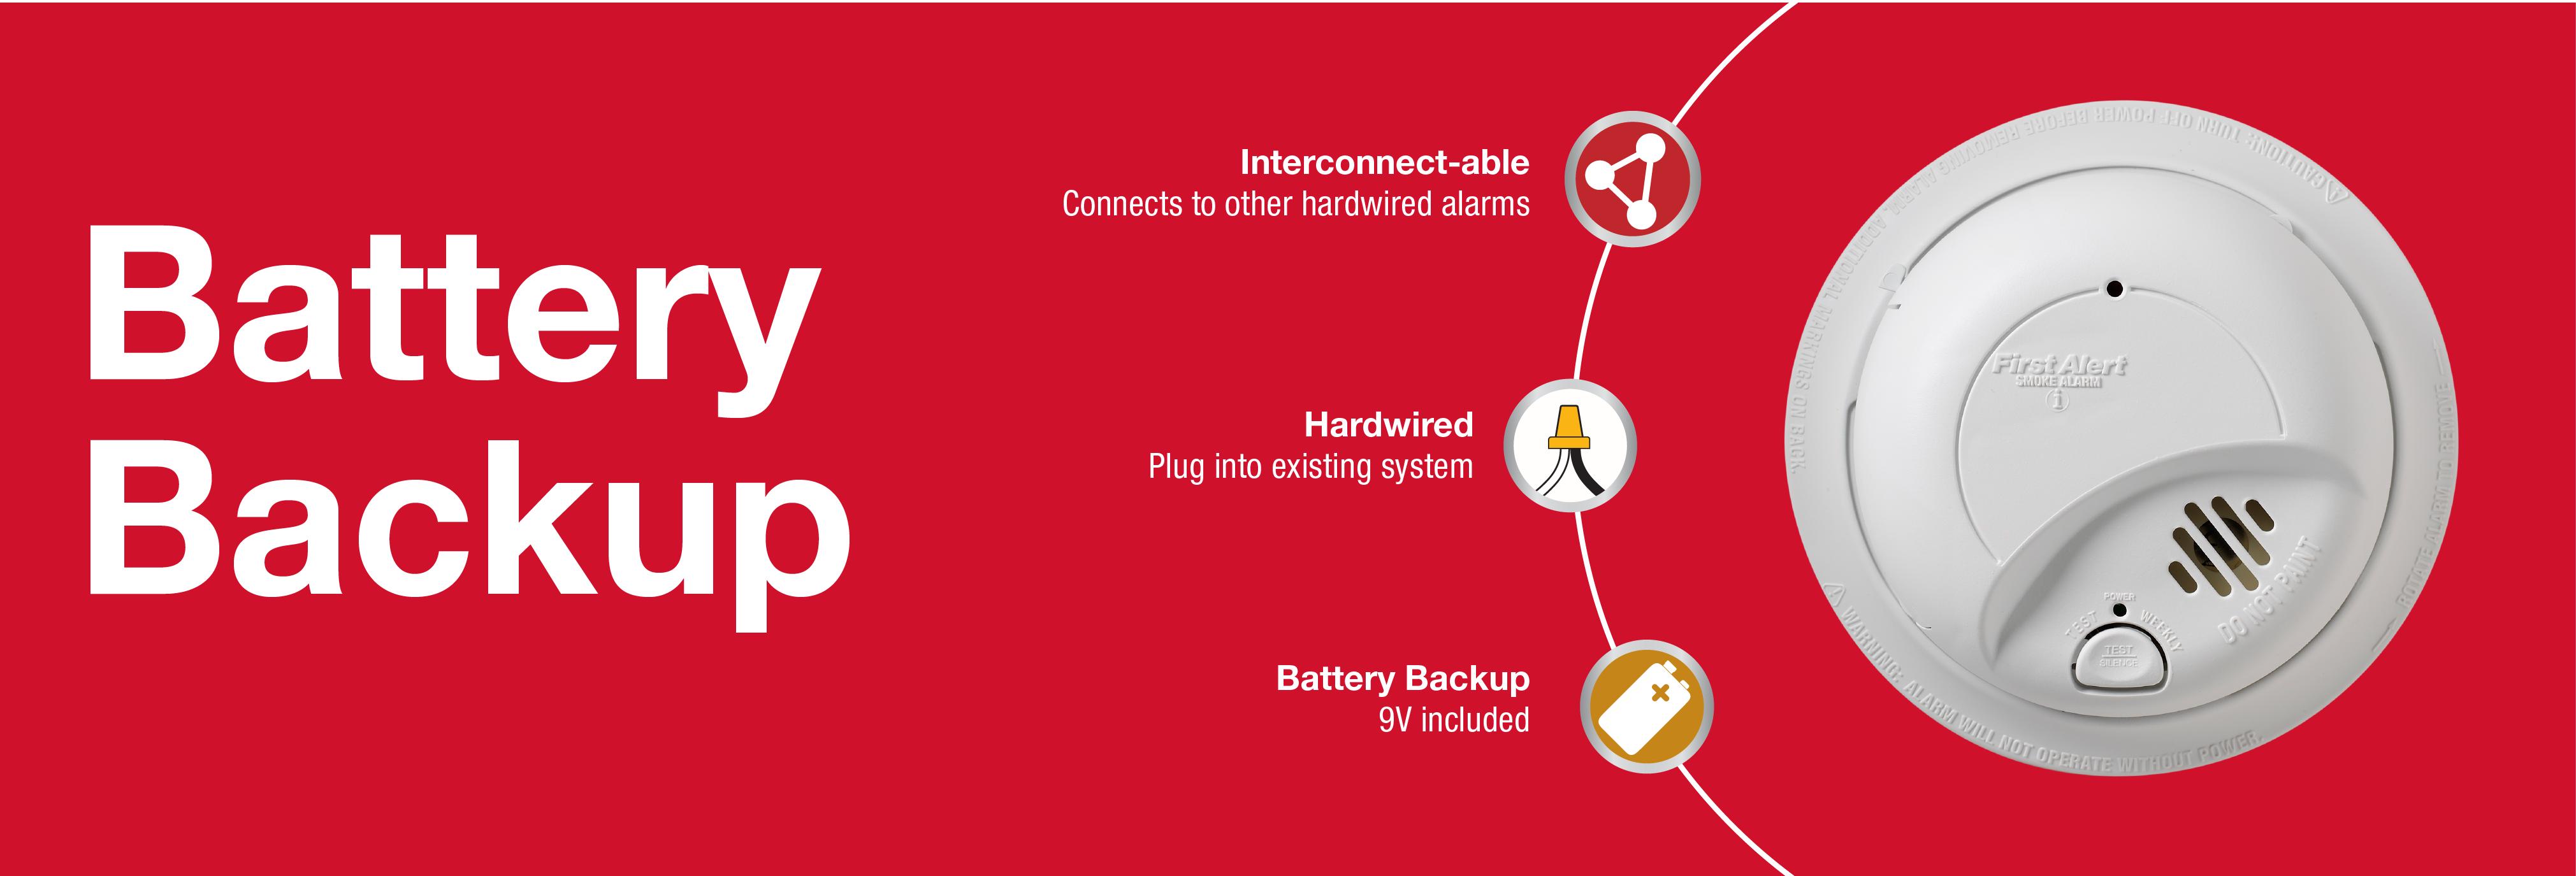 Pretty Wired Fire Alarm Images How To Install A Hardwired Smoke Backup Wiring Diagram 0e0ffc79 3e8e 4b8e A38e 814e4345300c Cb294002231